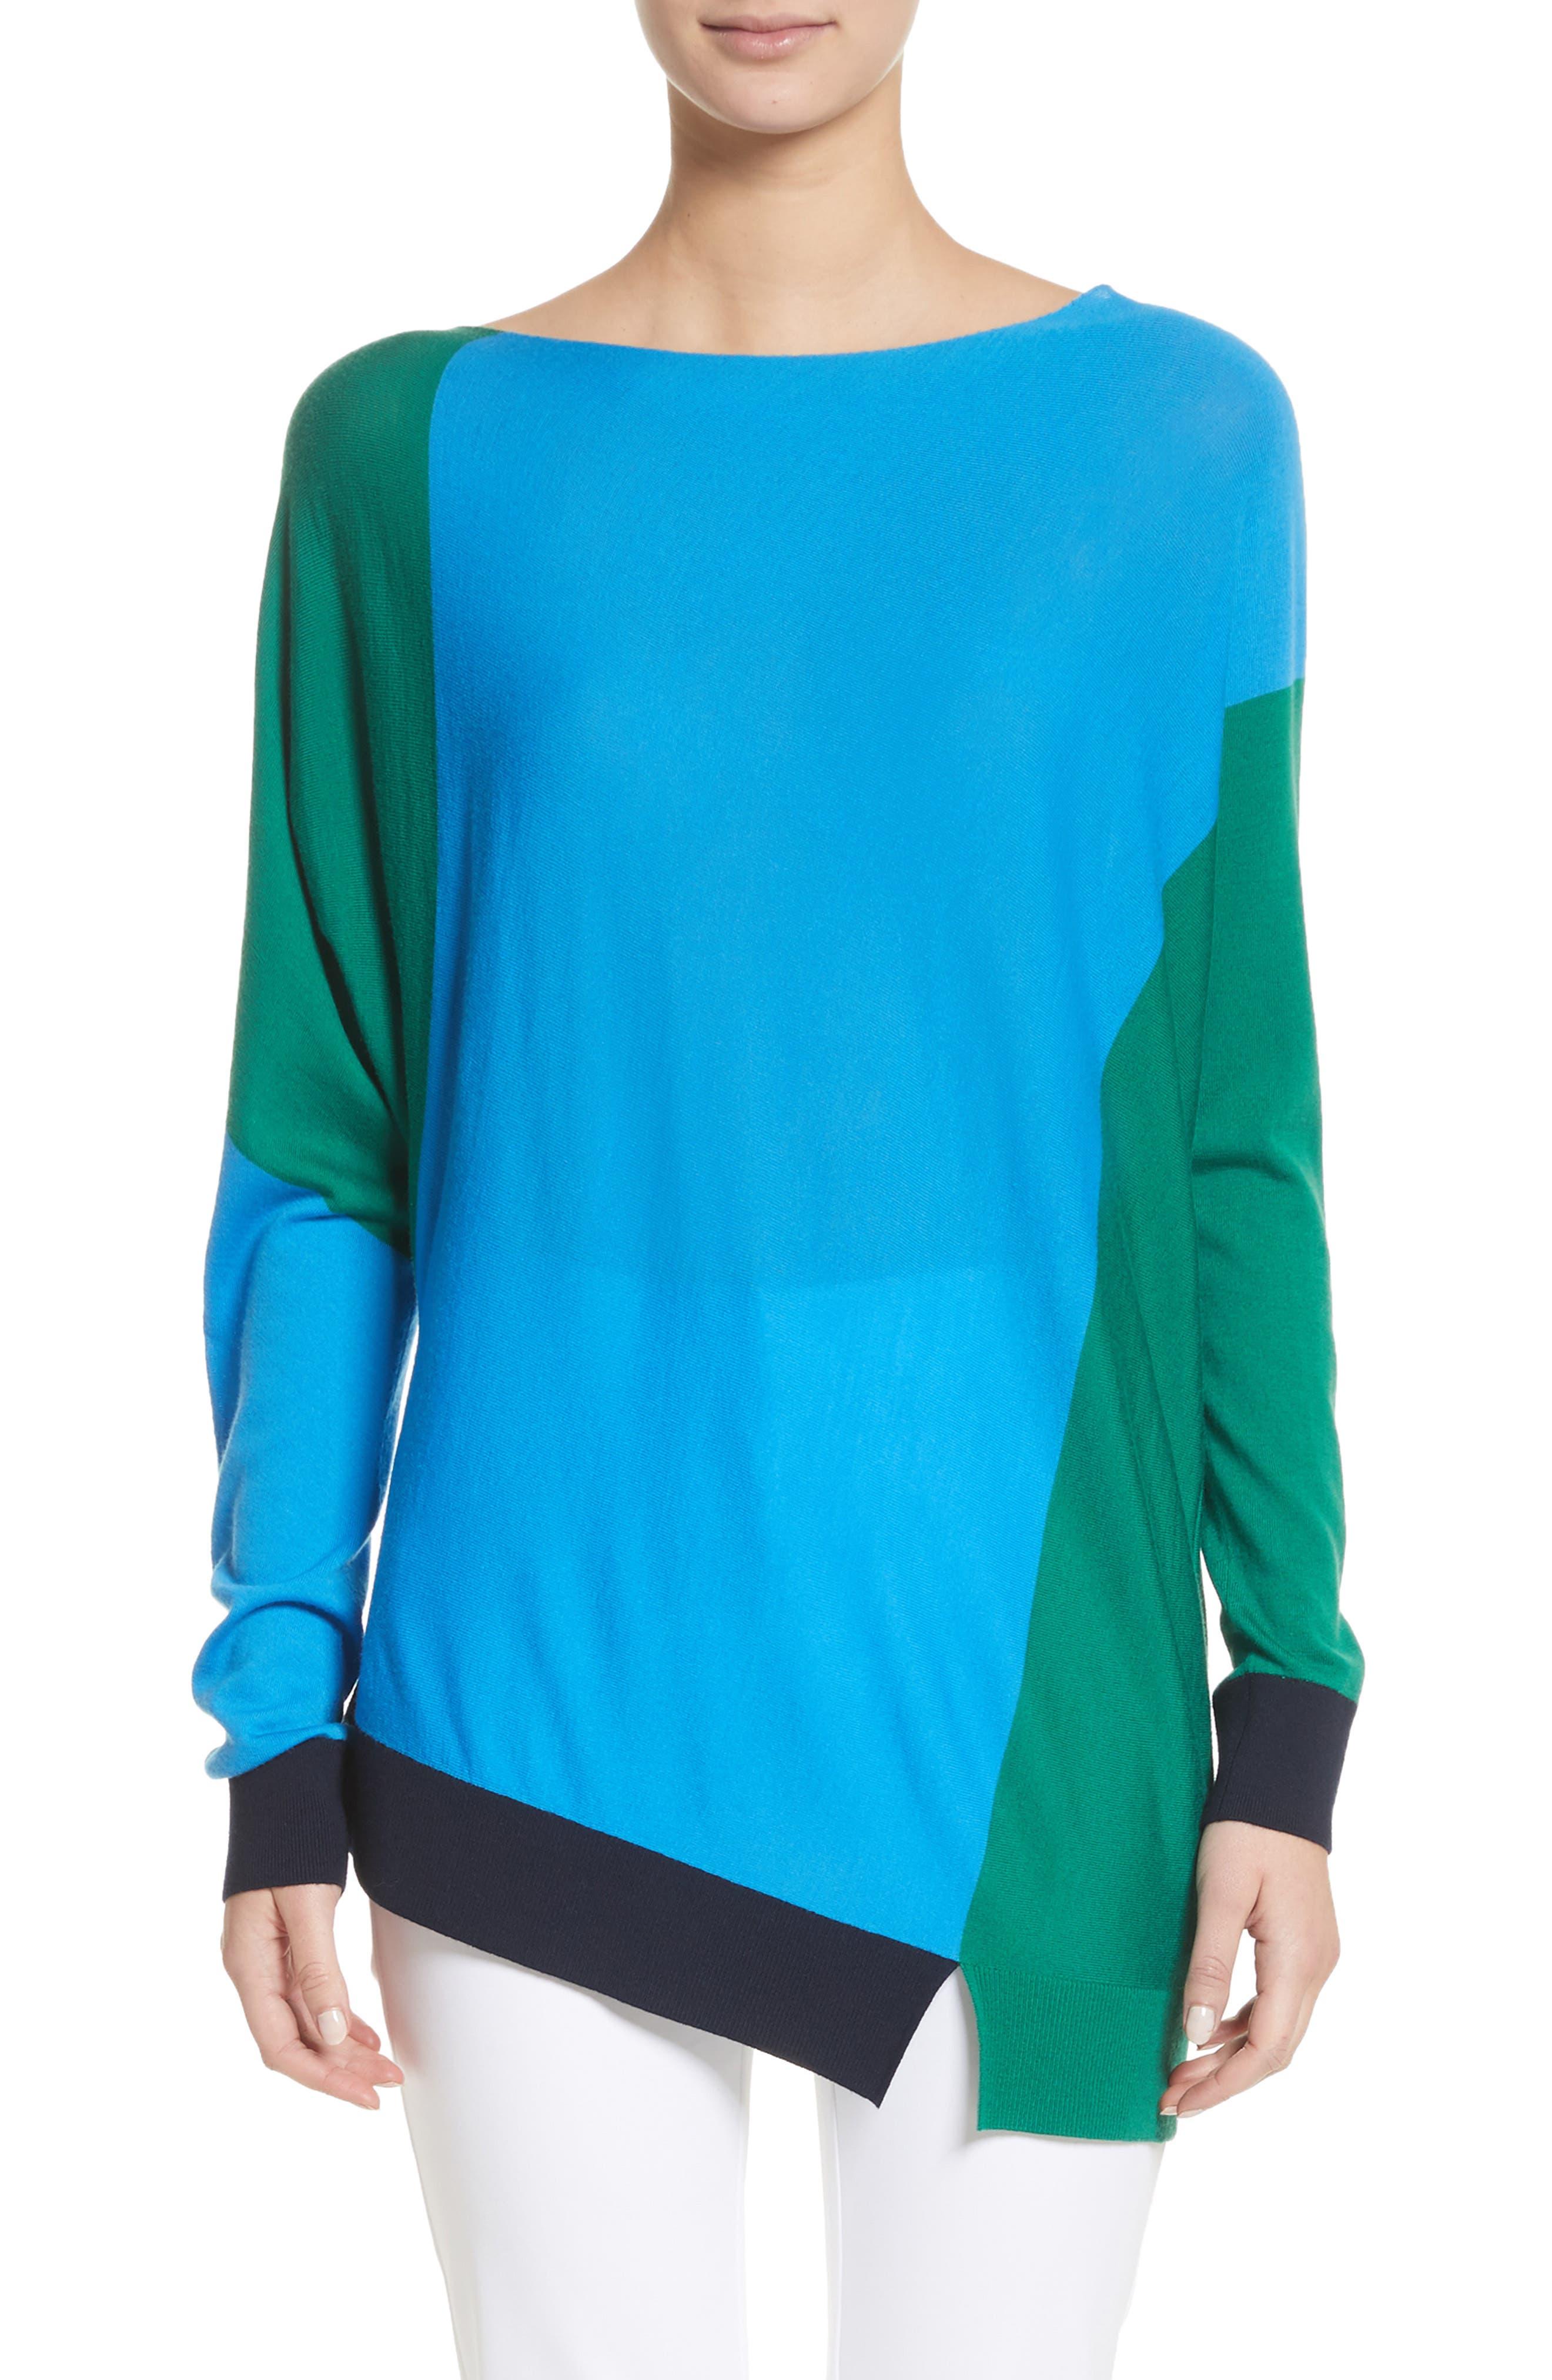 Colorblock Knit Wool Sweater,                             Main thumbnail 1, color,                             Cyan/ Emerald/ Navy